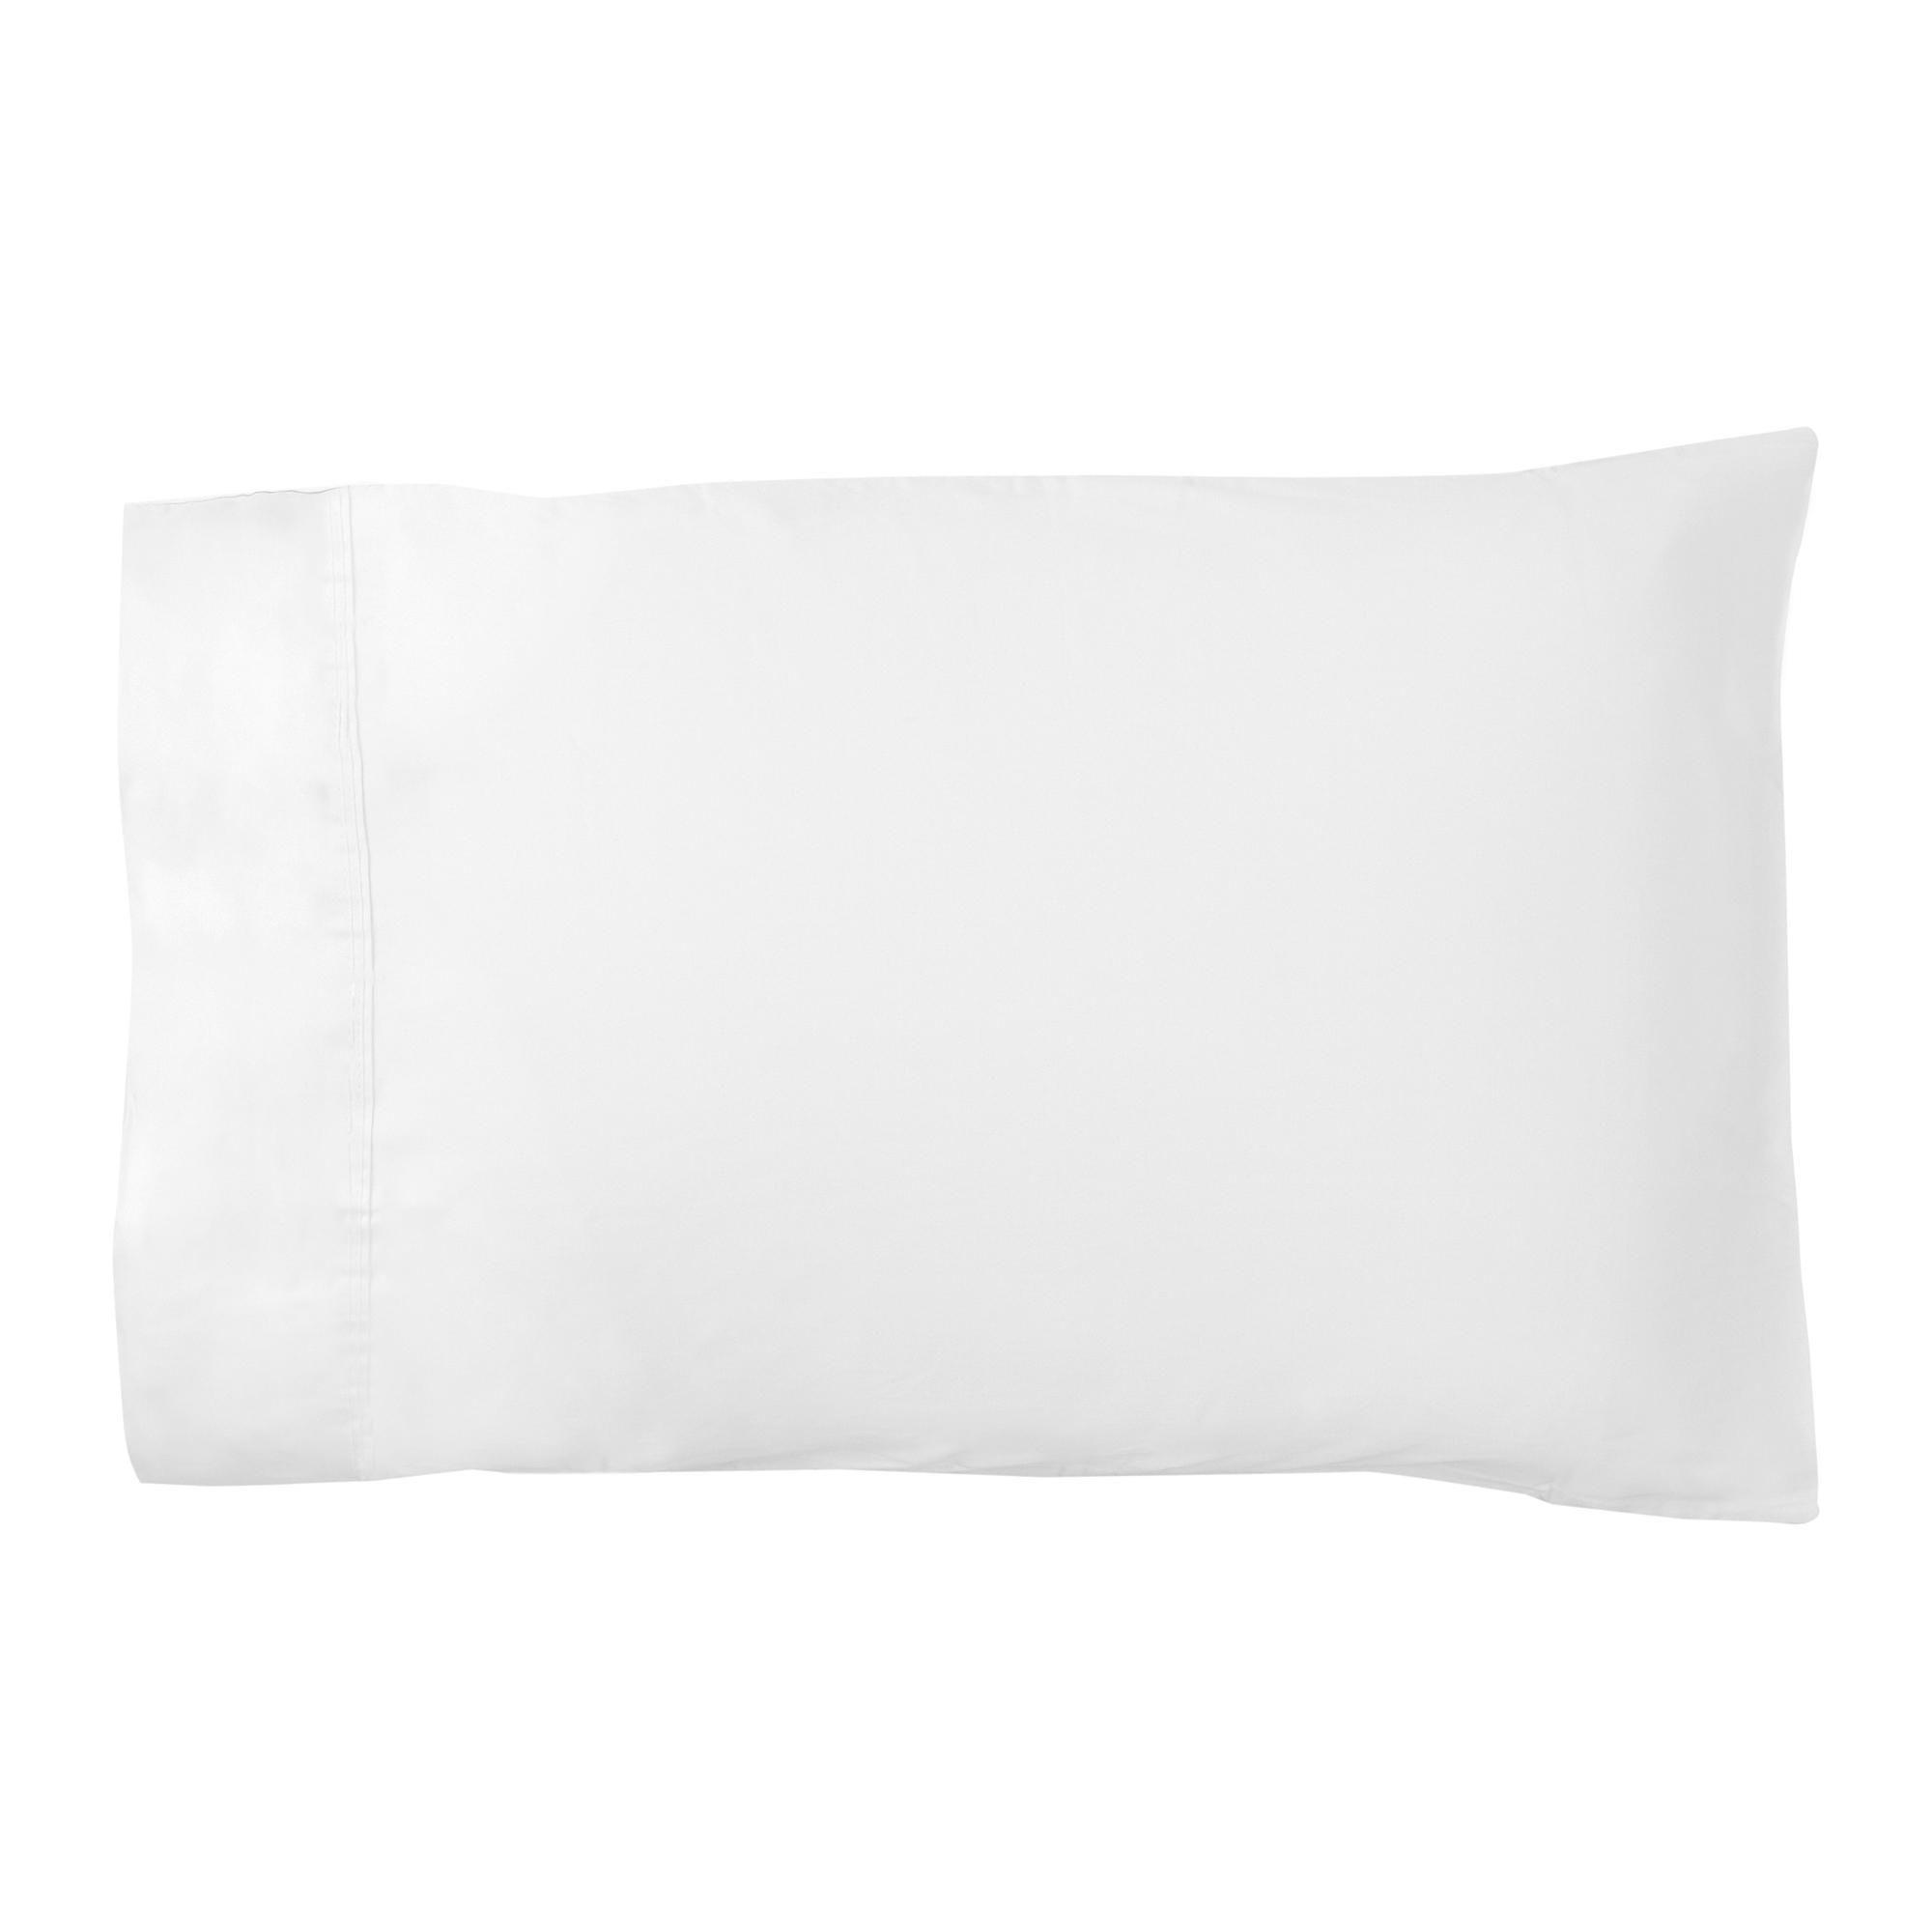 Dorma Extra Soft Pillowcase. 500 Thread